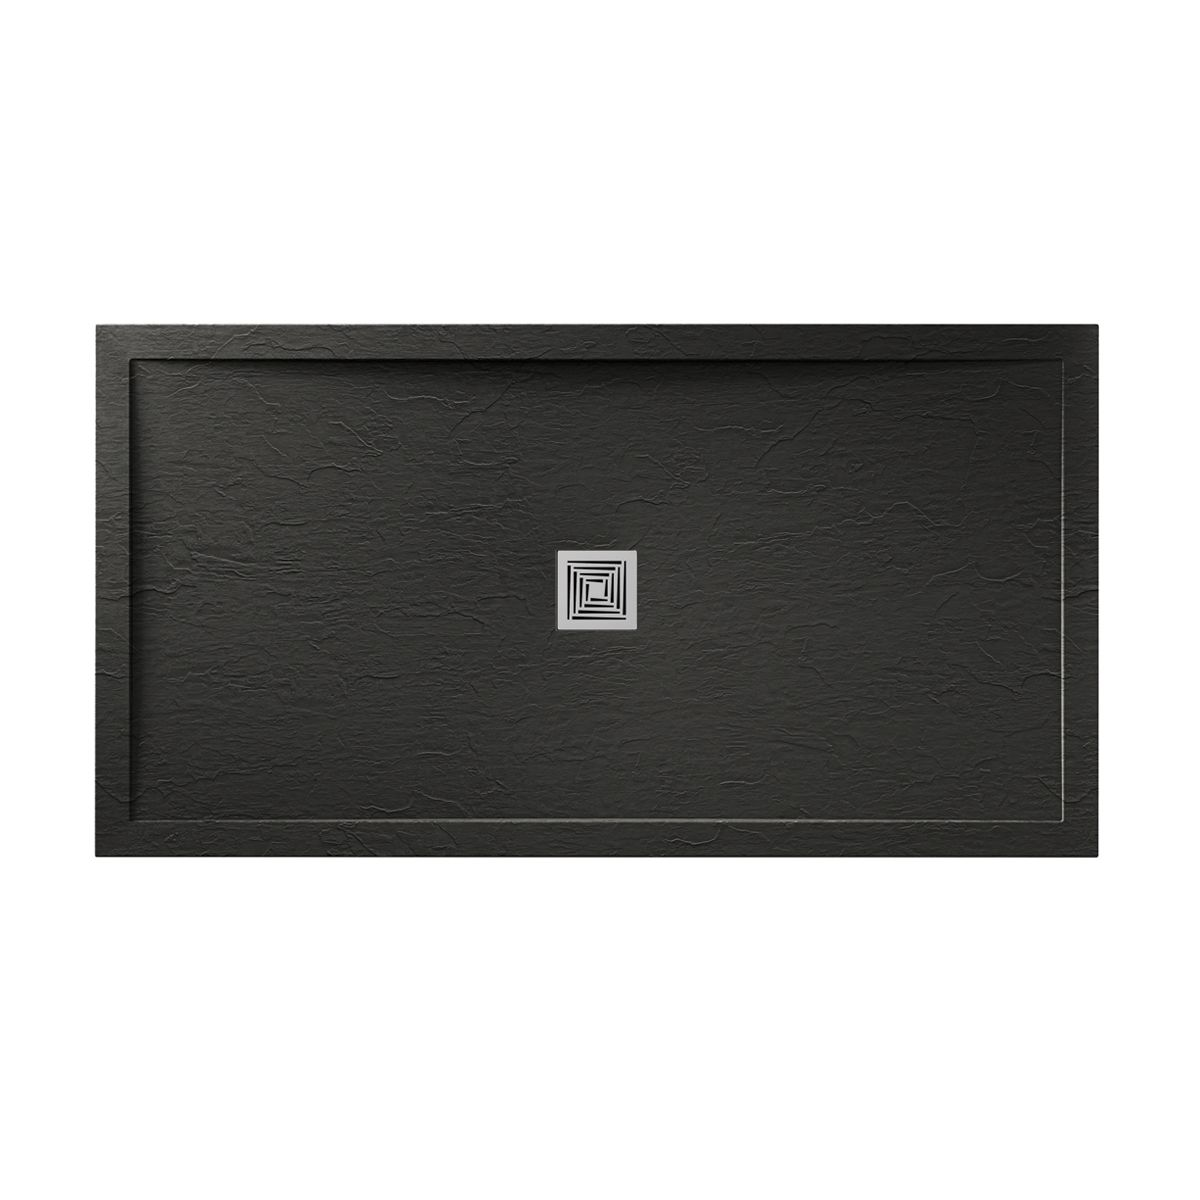 Aquadart Black Slate Shower Tray 1200 x 700